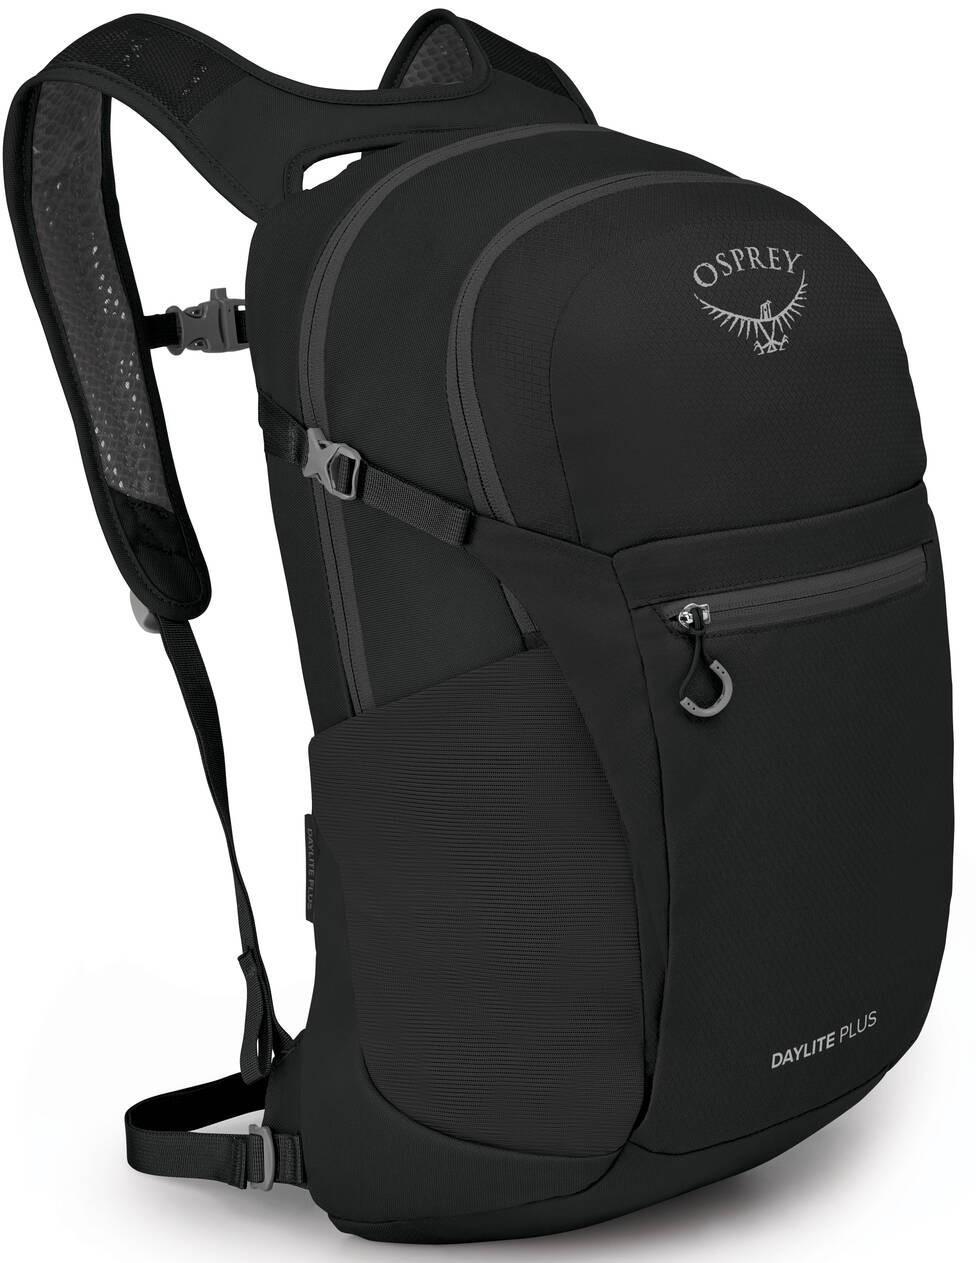 Городские рюкзаки Рюкзак городской Osprey Daylite Plus Black Daylite_Plus_S21_Side_Black_web.jpg